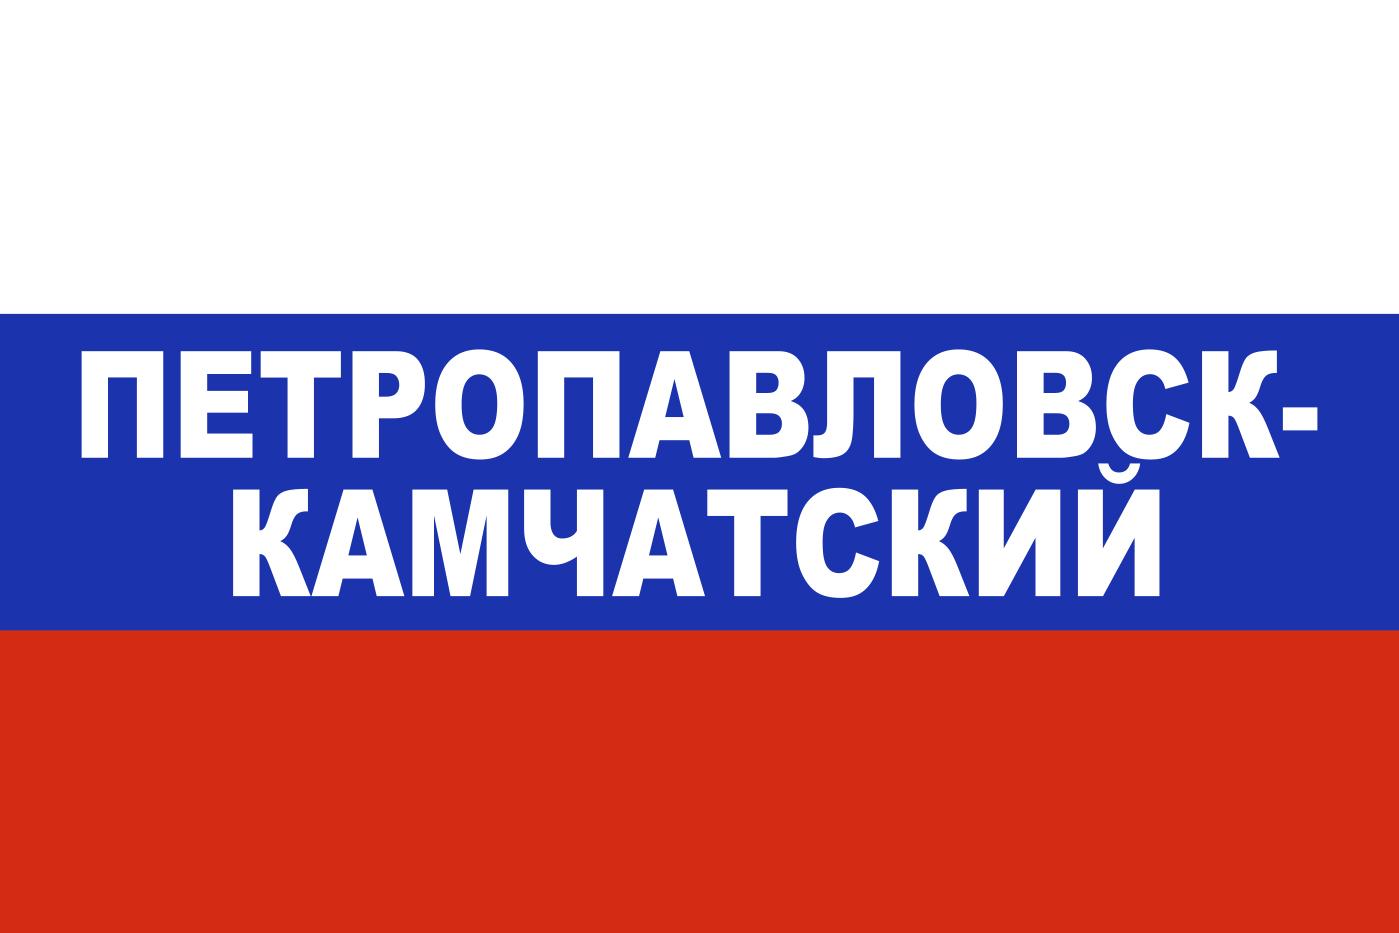 Флаг триколор Петропавловск-Камчатский